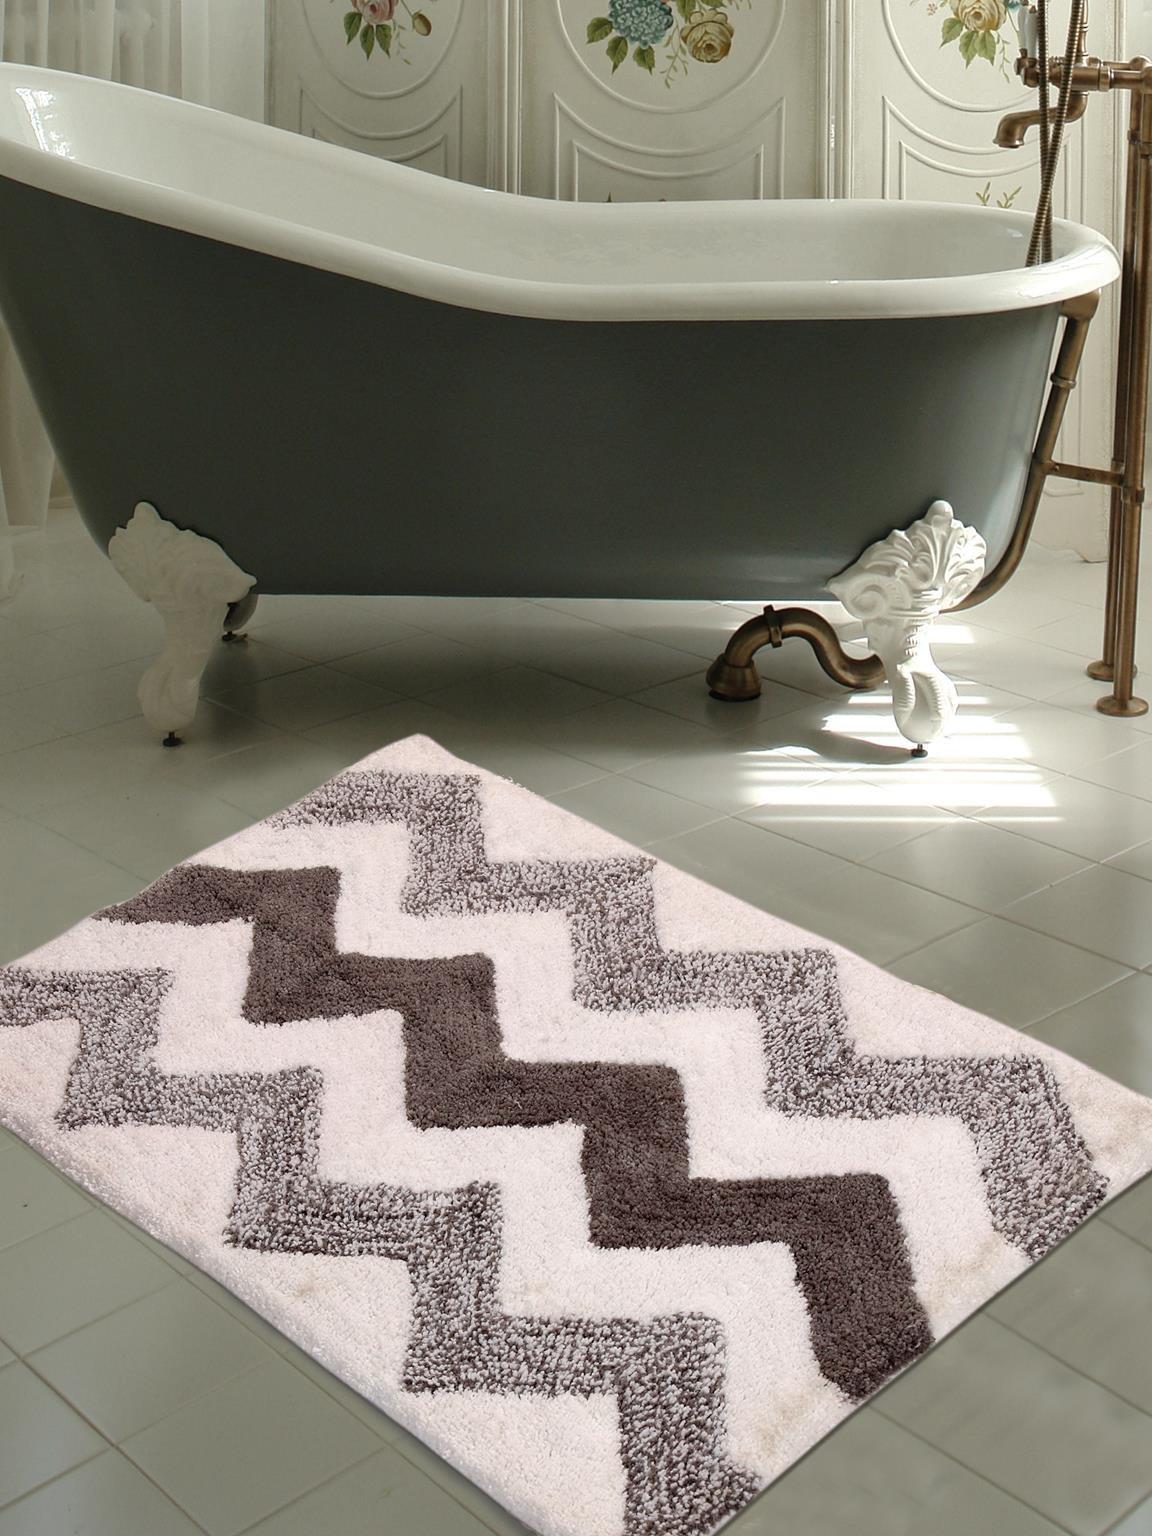 WARISI - Tonal Chevron Collection - Designer, Plush microfiber Bath Rug, 34 x 21 inches (Grey White)